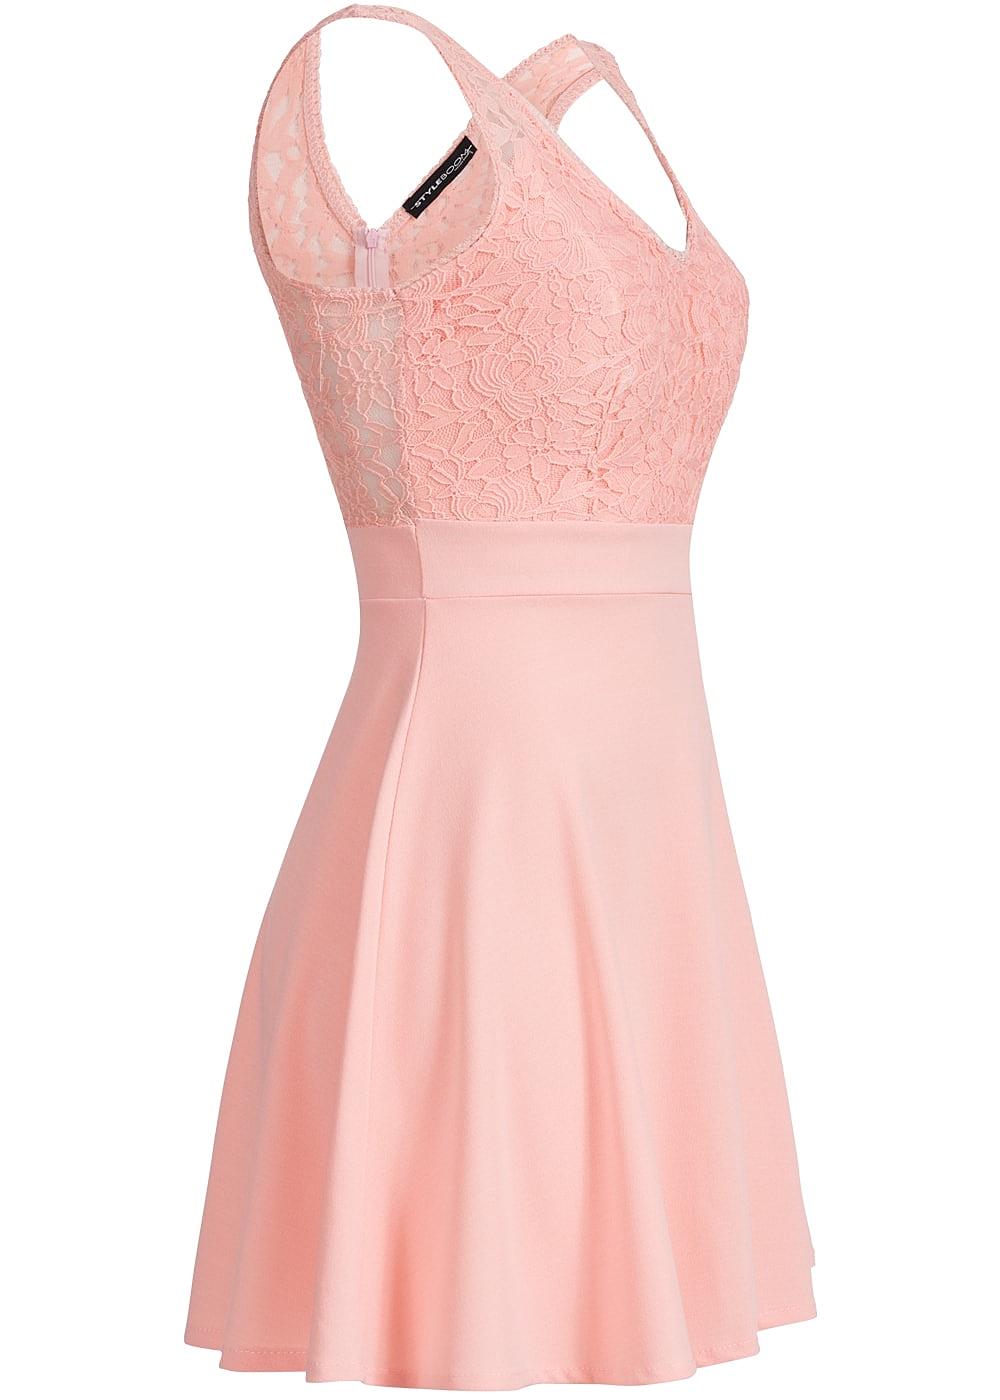 Kleid pink spitze